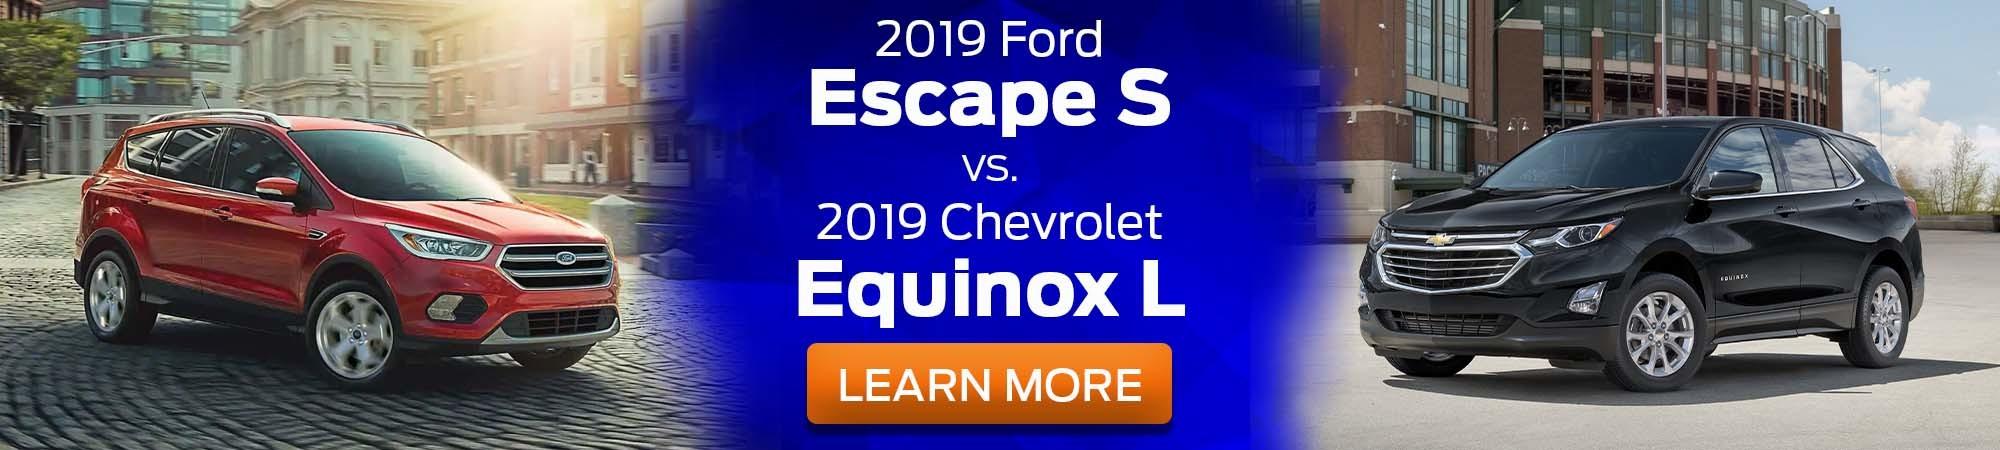 2019 Ford Escape S v 2019 Chevrolet Equinox L